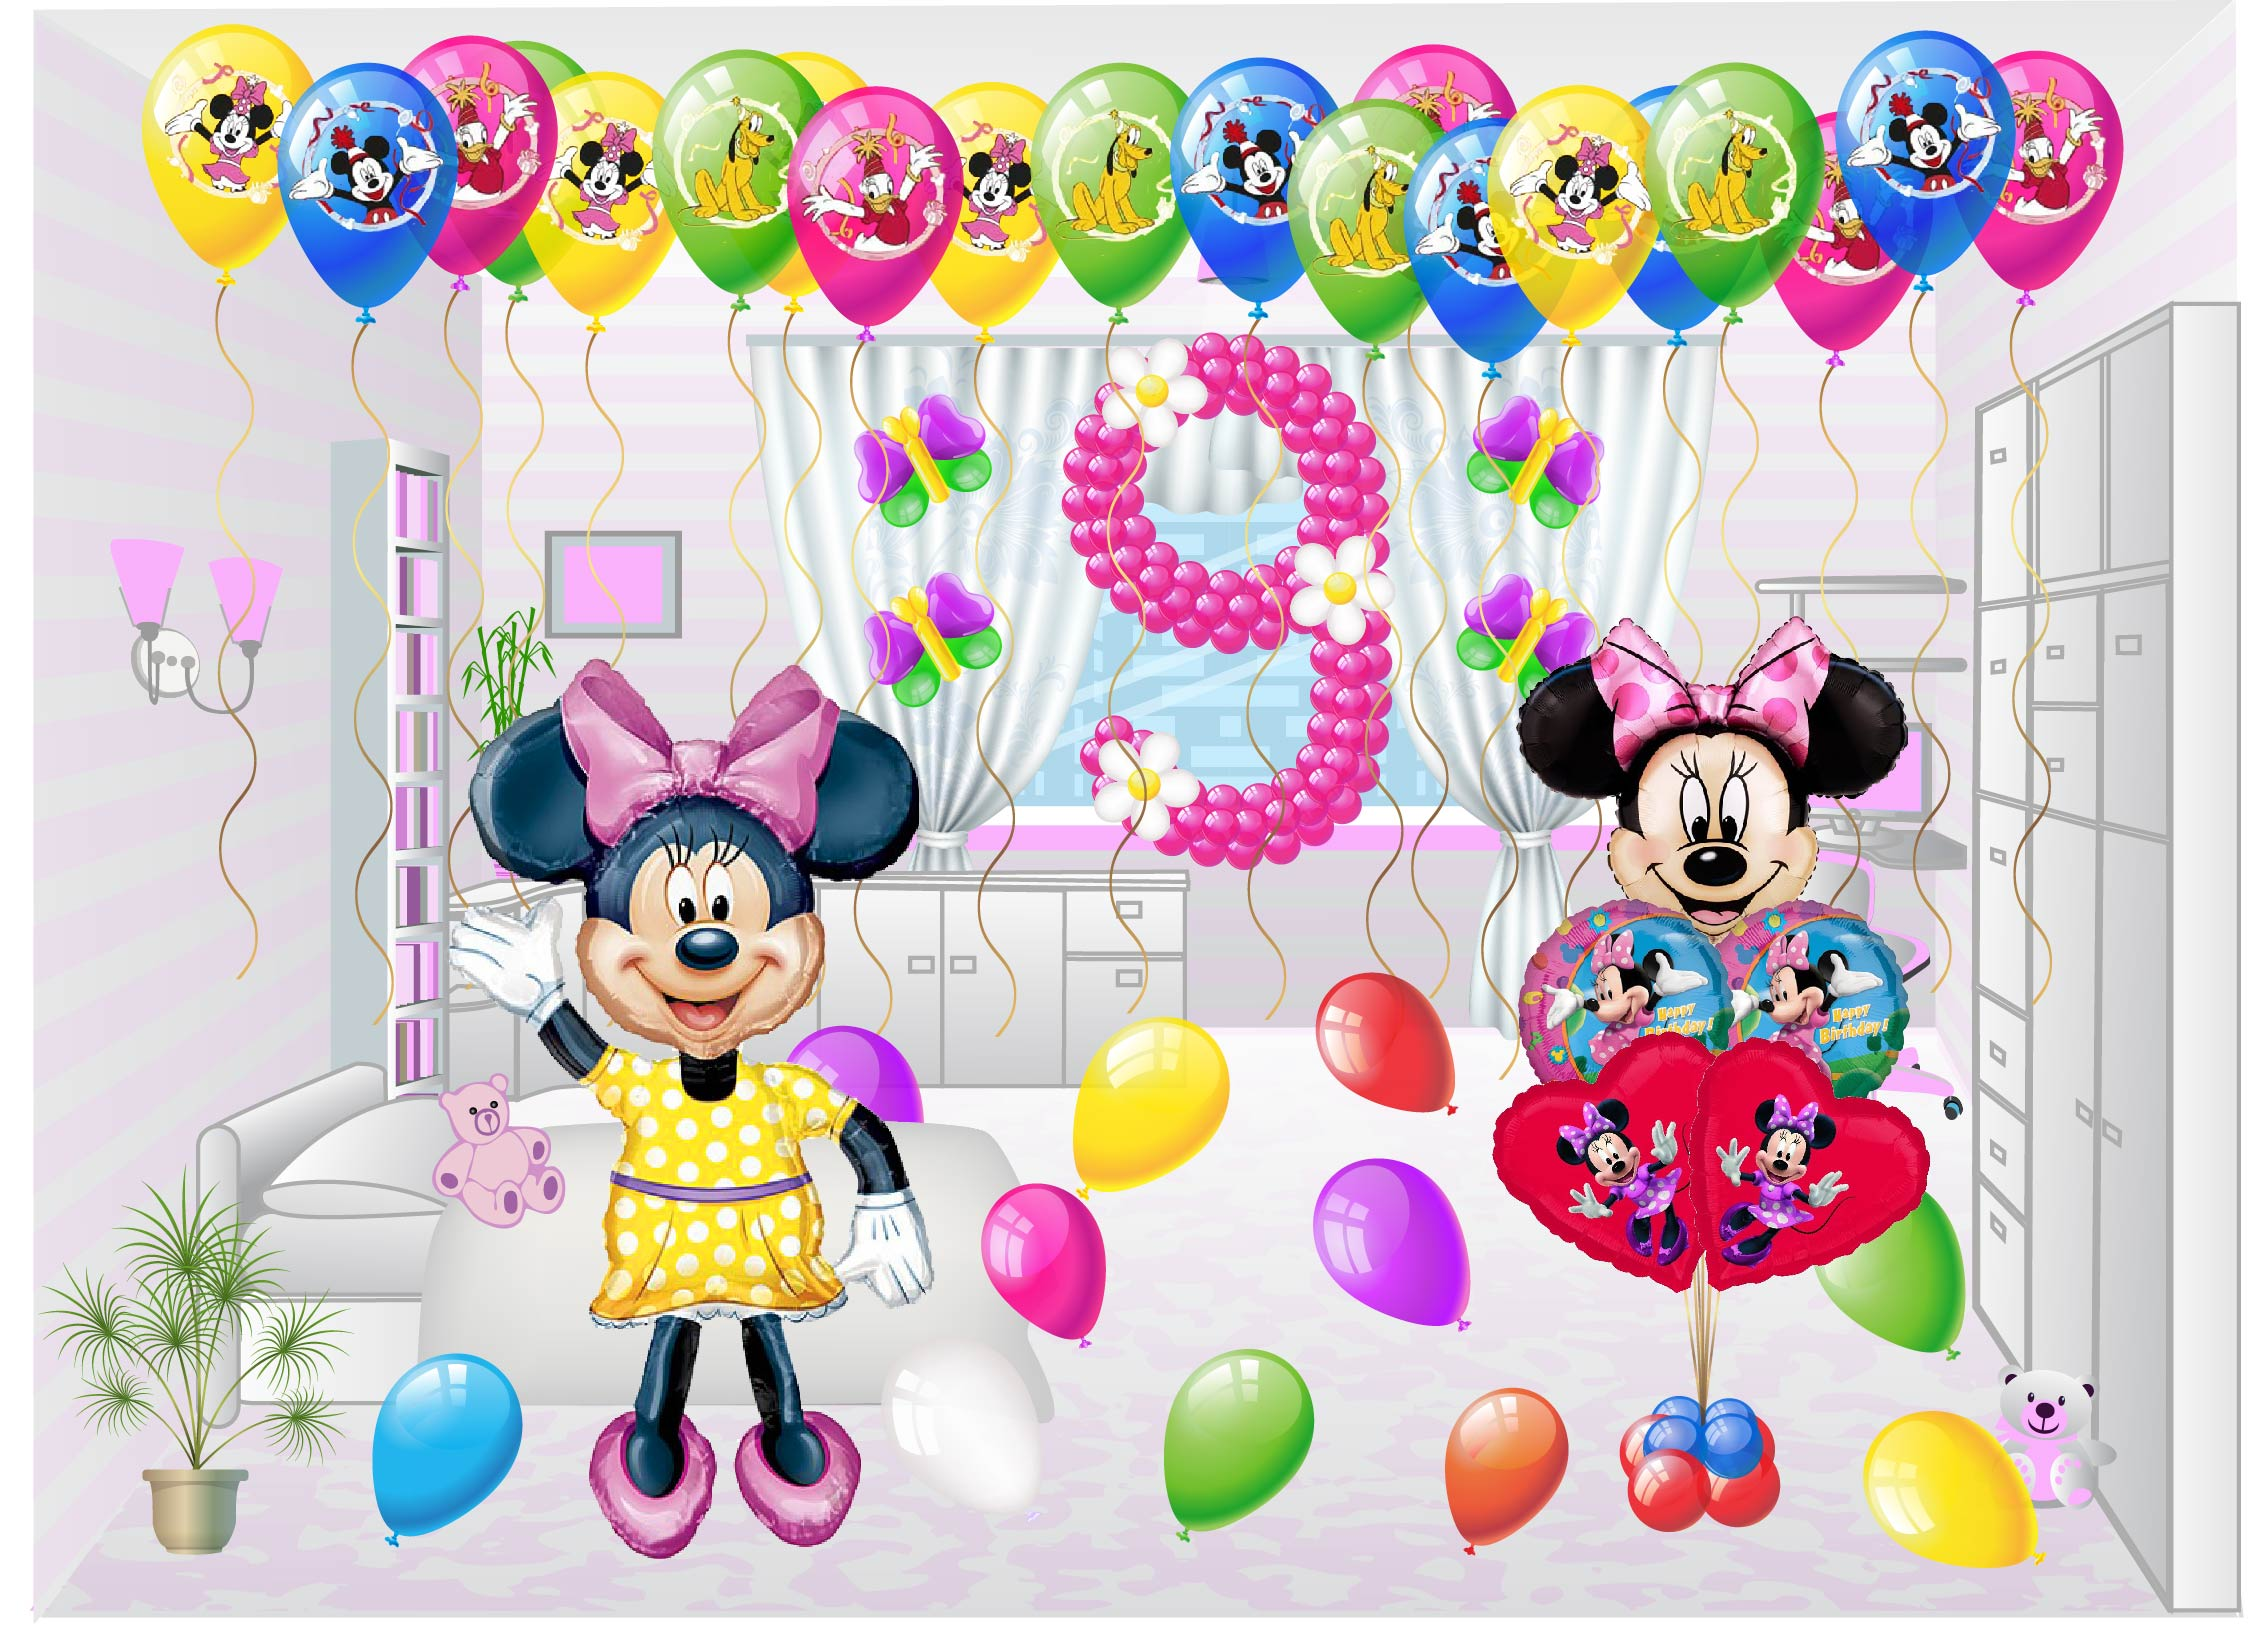 Balon kompozisyonları - hayal gücü gösterin